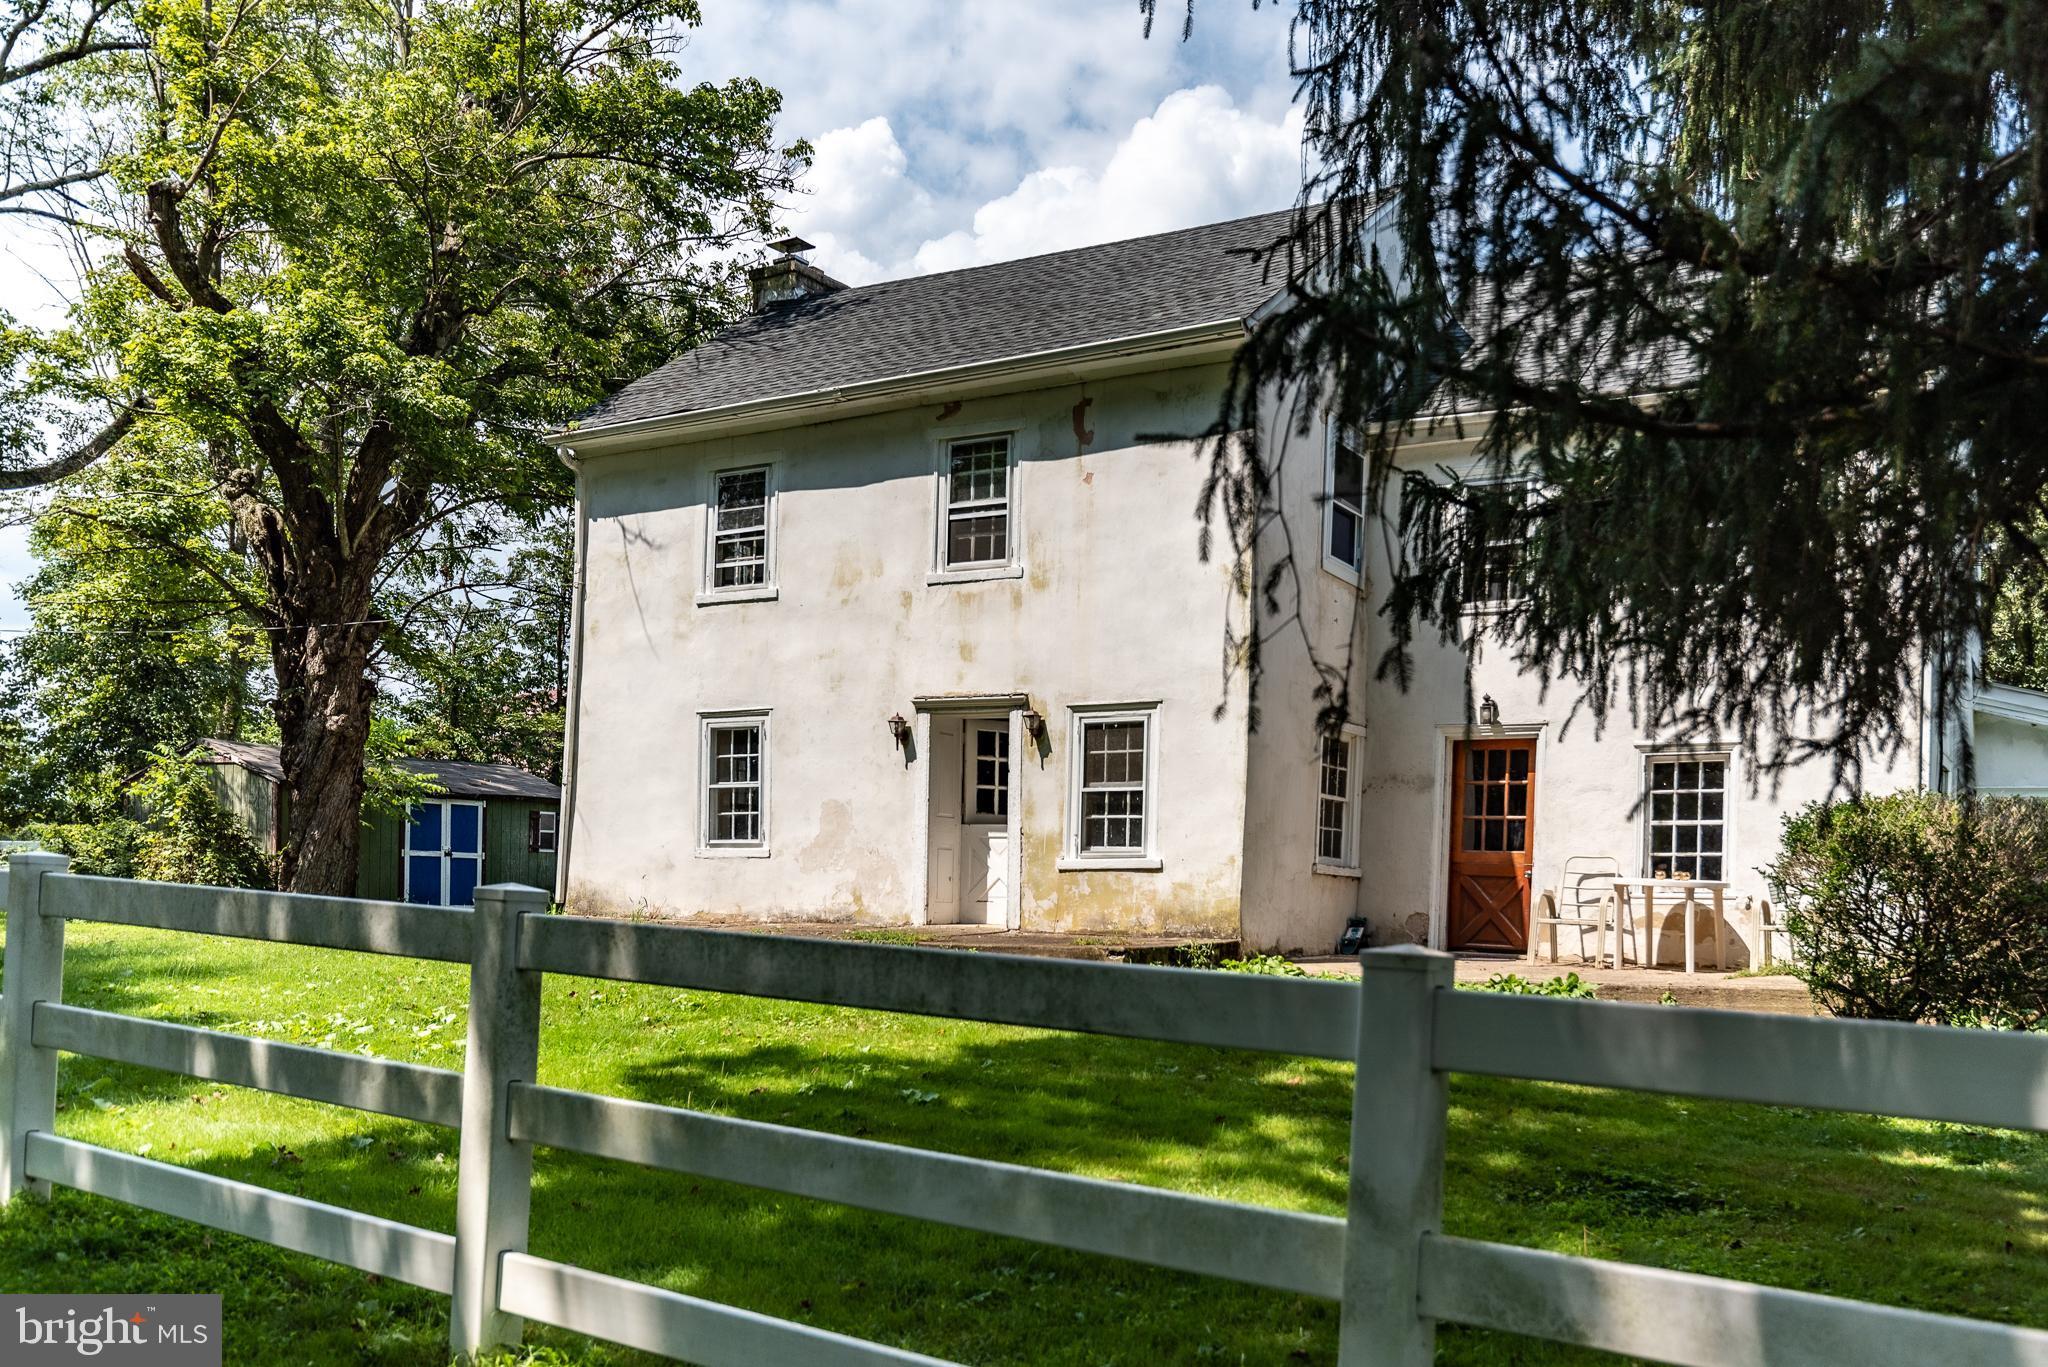 1710 LOWER ROCKY DALE ROAD, GREEN LANE, PA 18054